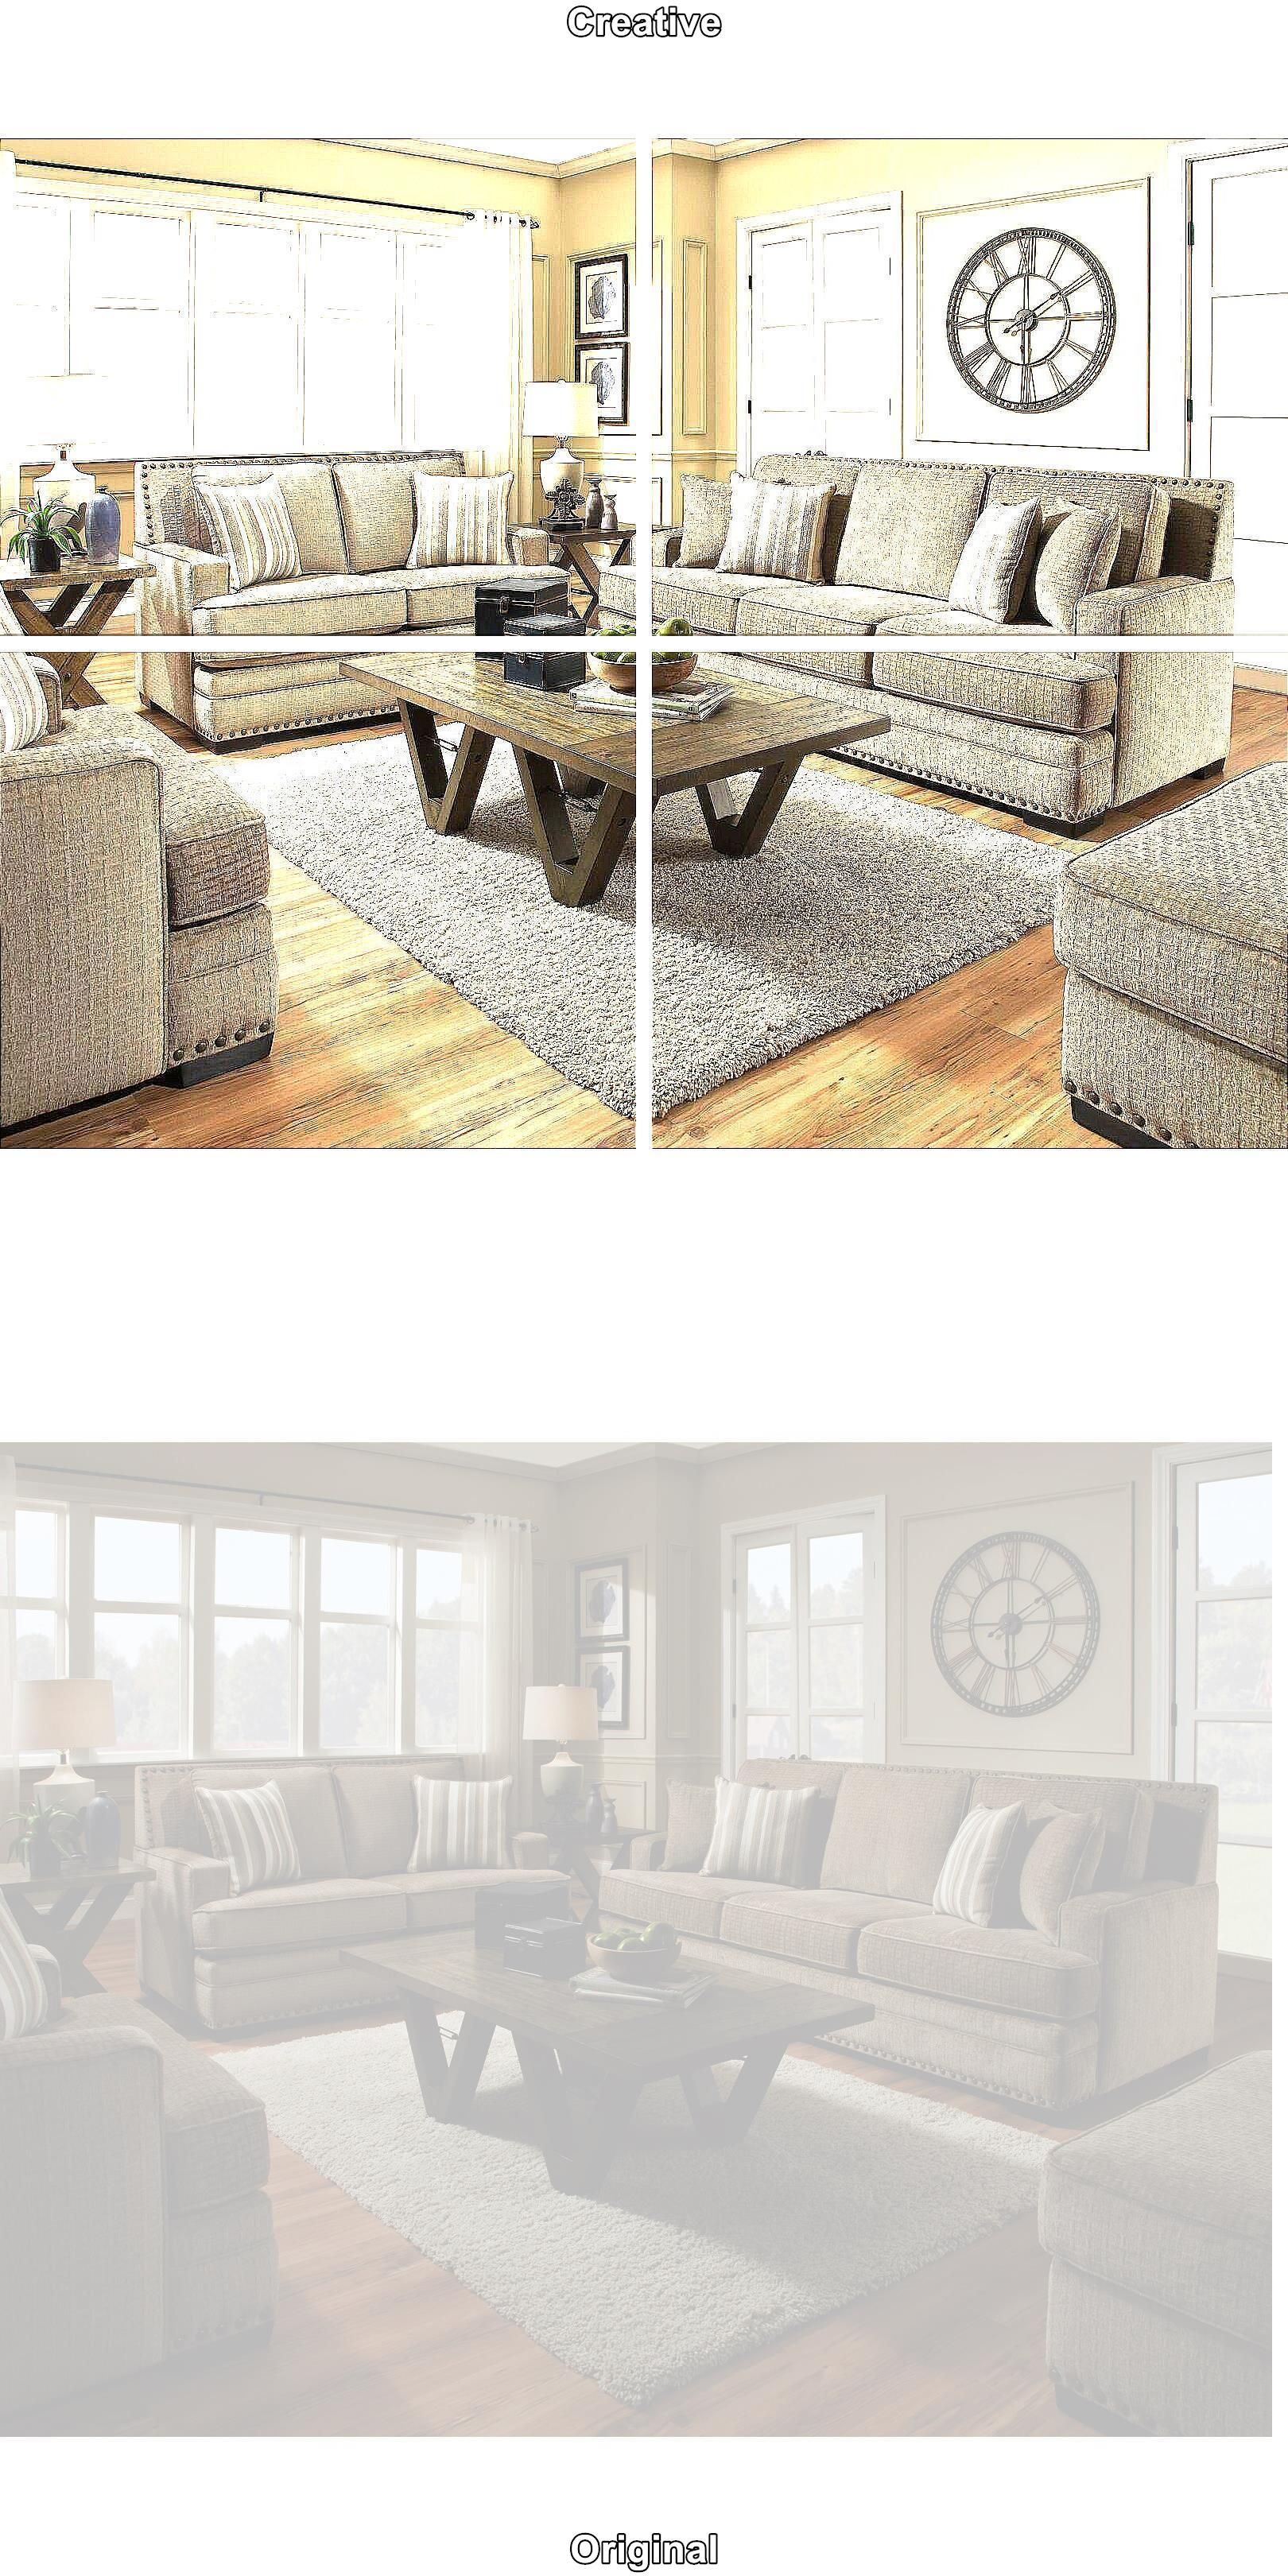 Small Living Room Designs Decorative Accessories For Living Room Latest Lounge Ro Lounge Room Design Country Living Room Furniture Small Living Room Design